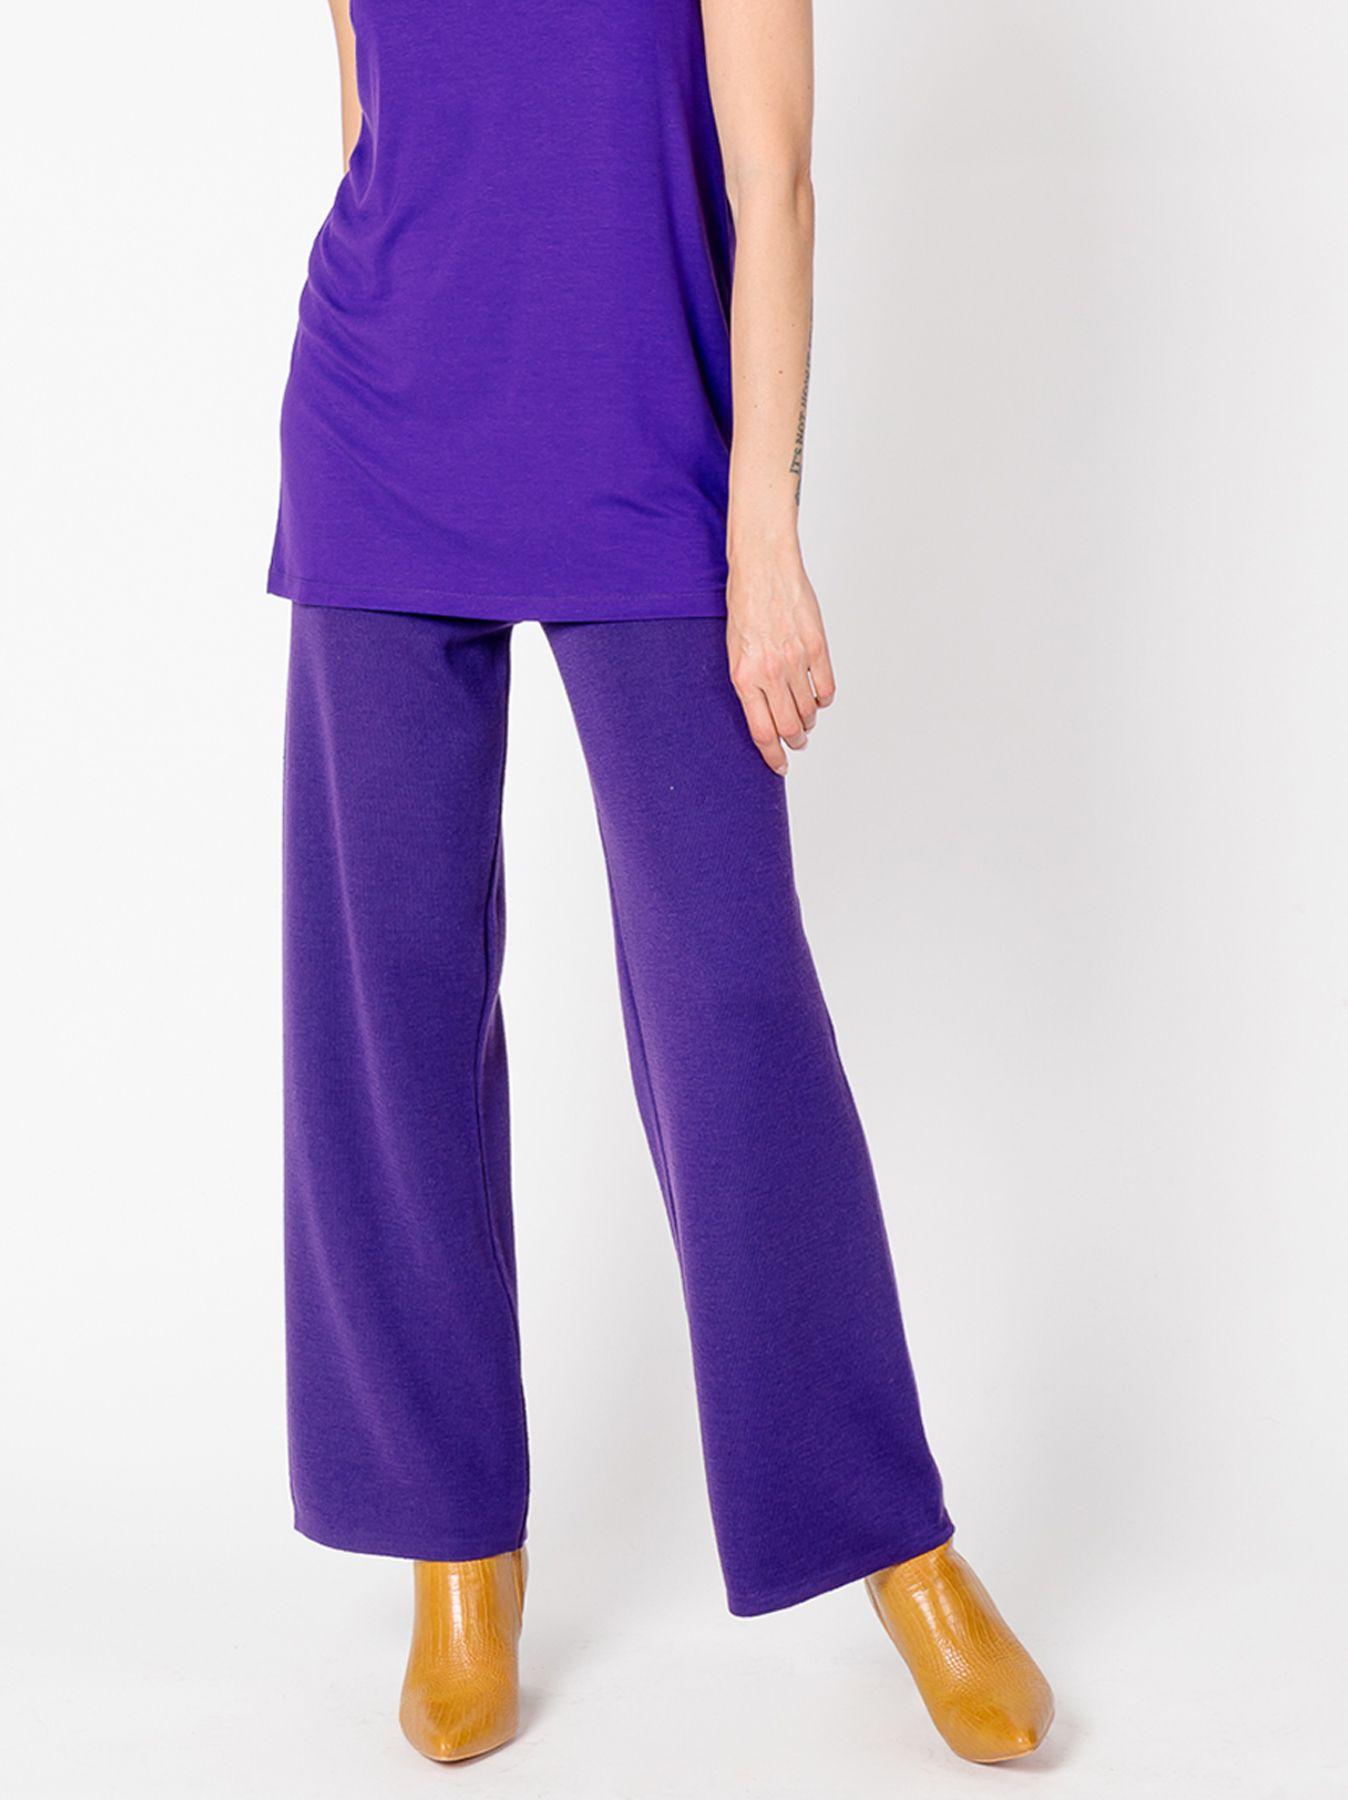 Pantalone elastico VIOLA